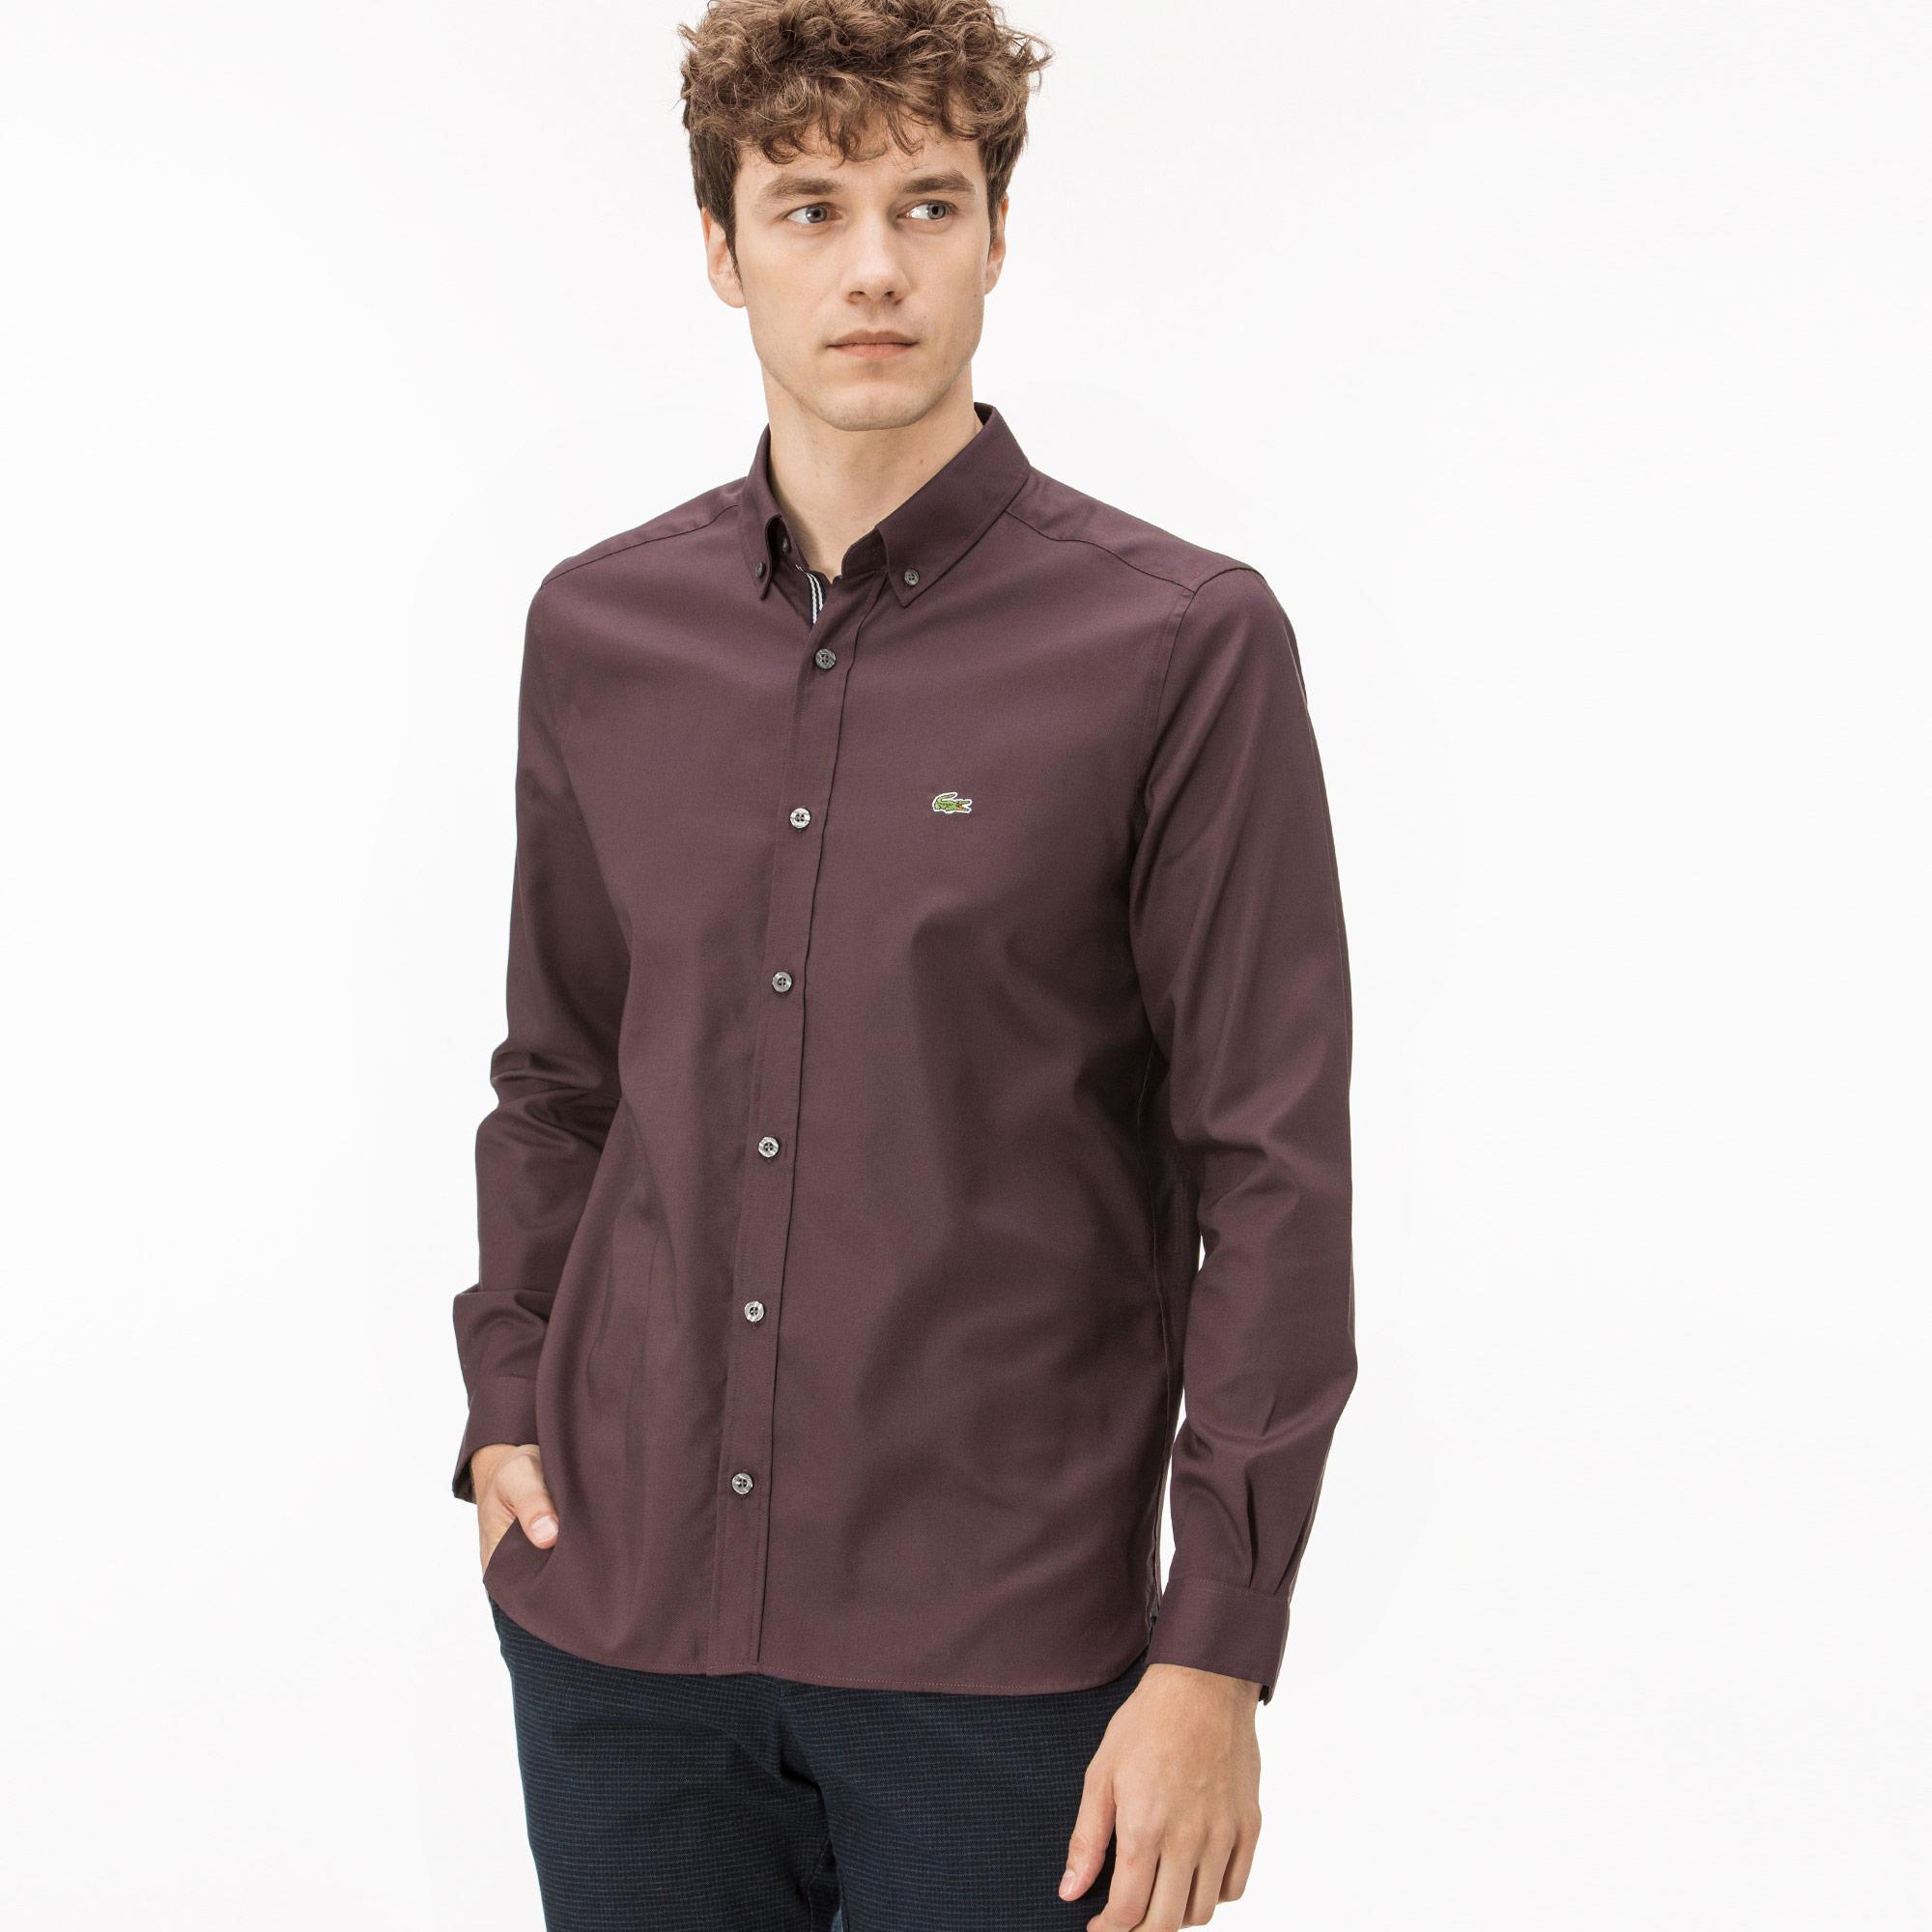 Lacoste Erkek Slim Fit Bordo Oxford Gömlek